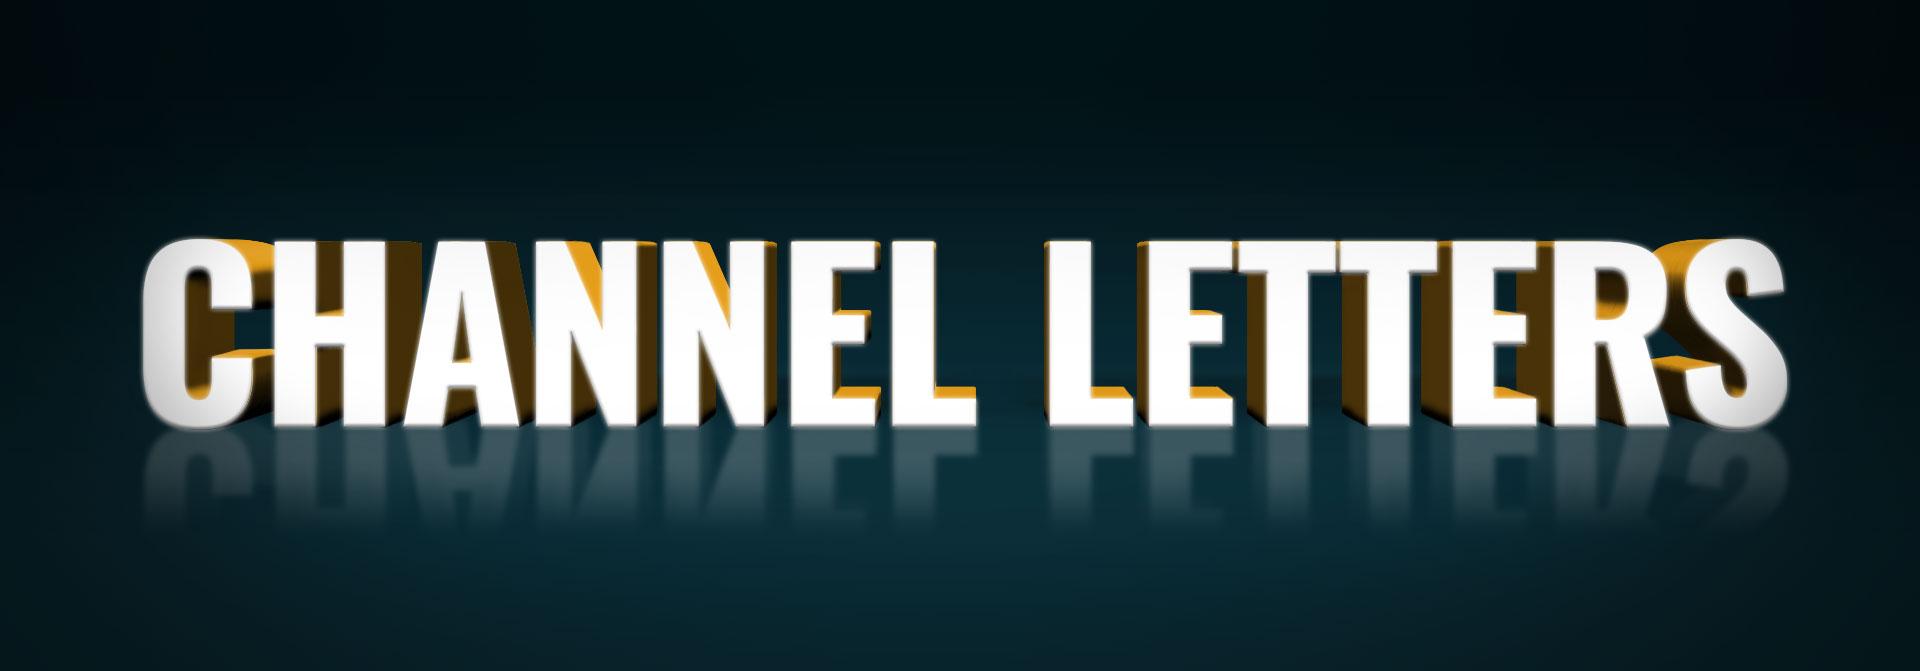 channel letters definition